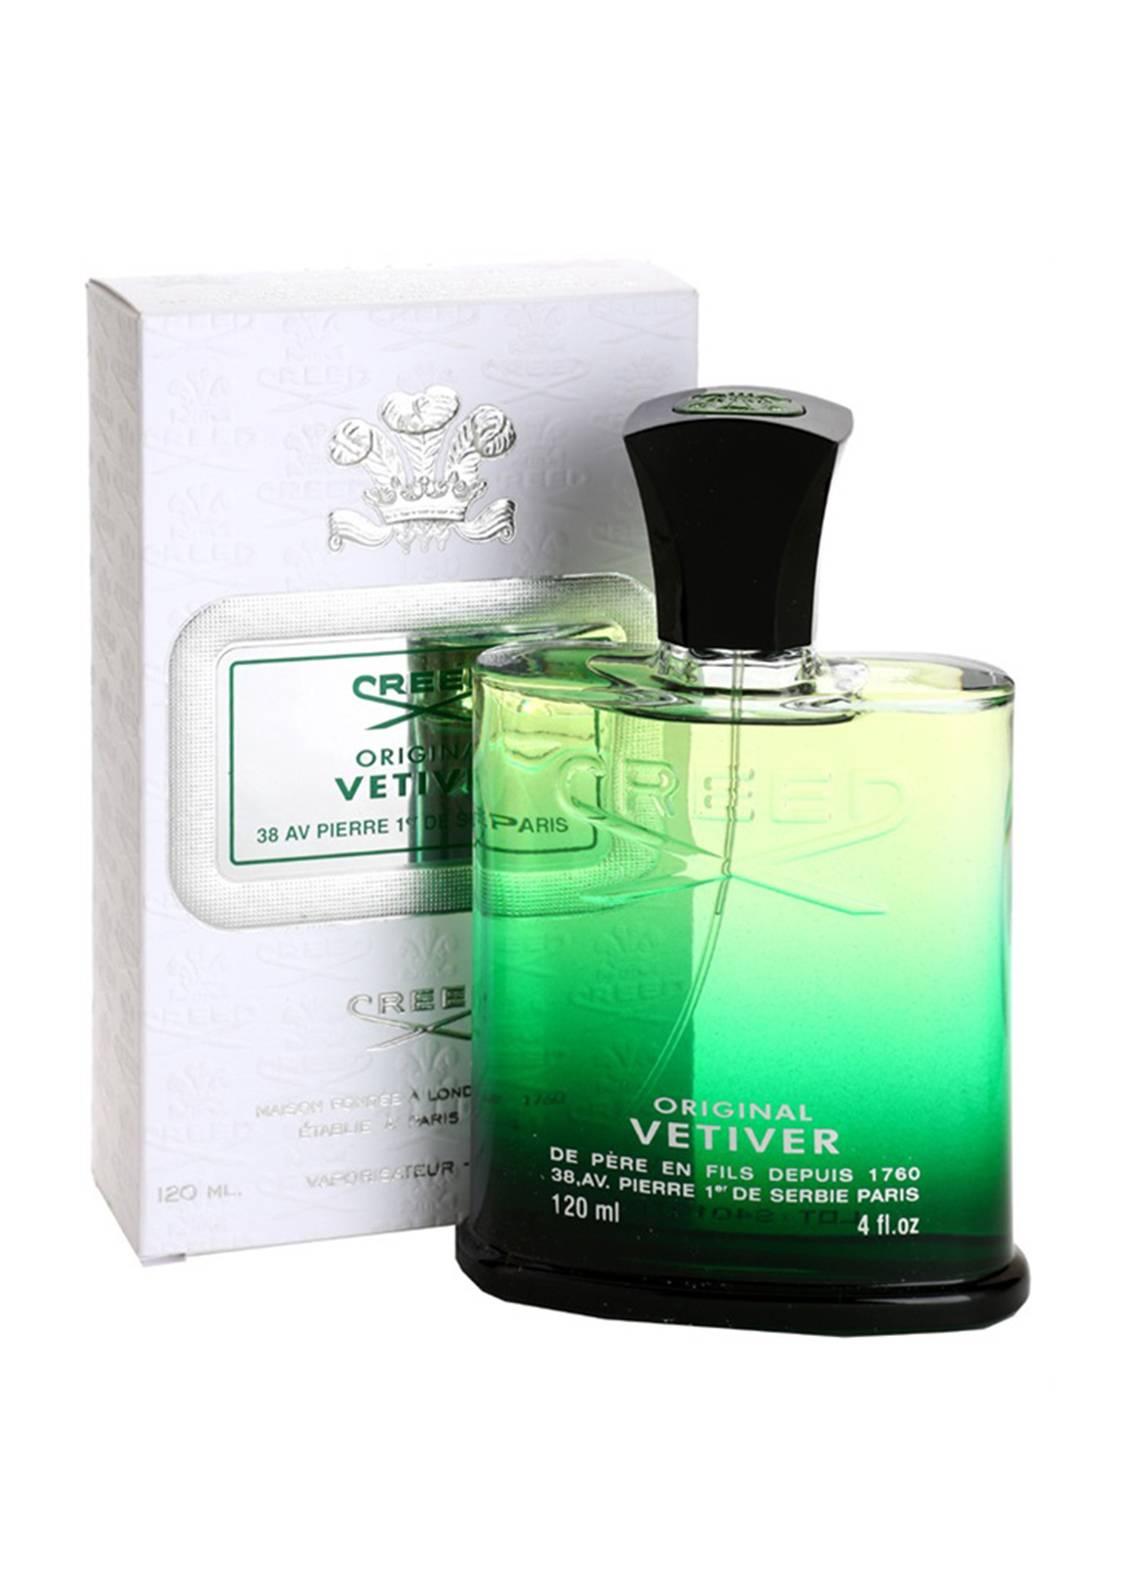 Creed Original Vetiver Perfume for unisex